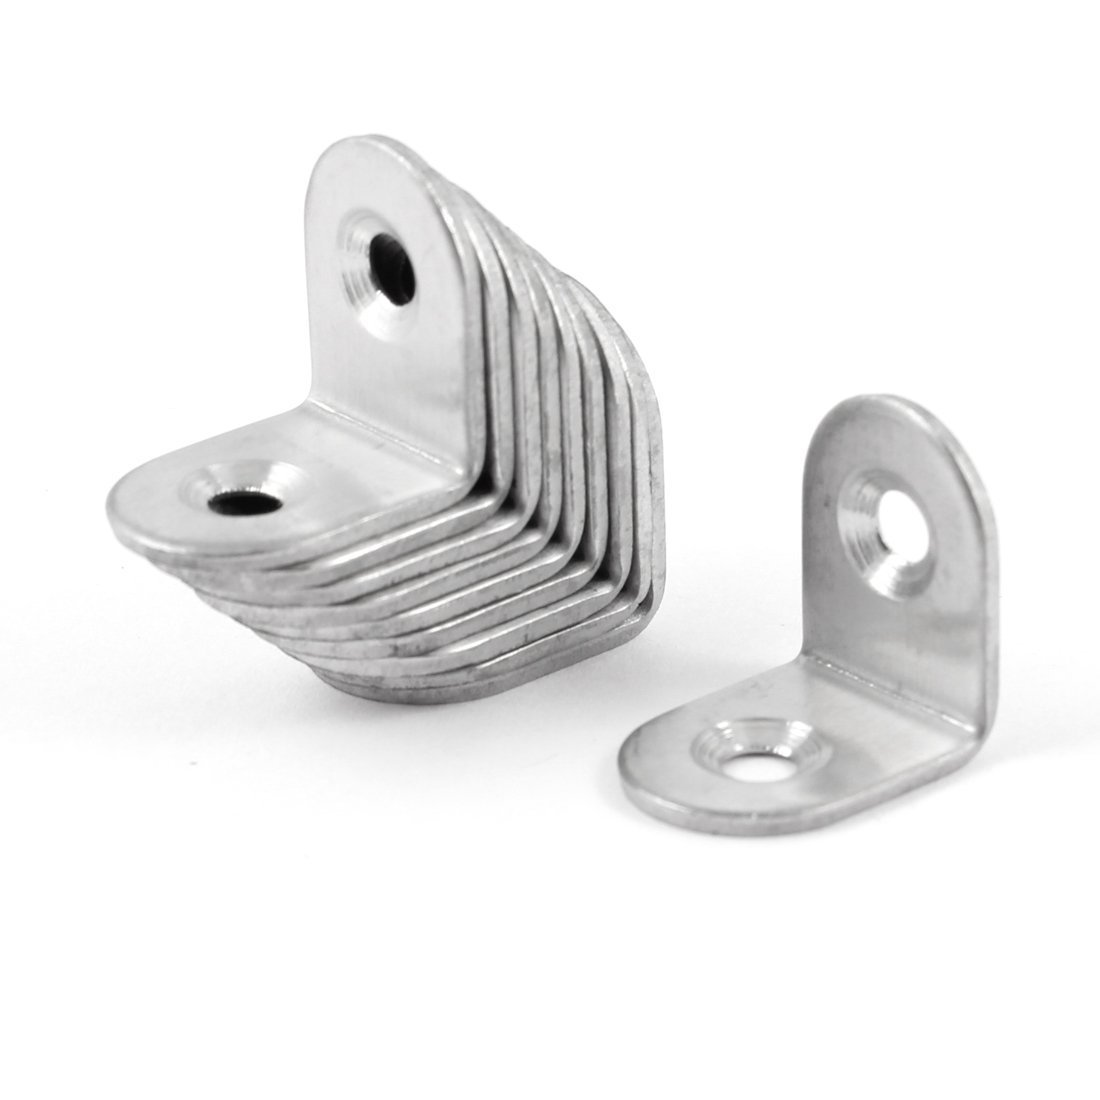 VNDEFUL 20PCS 20mmx20mm Stainless Steel 90 Degree Angle Bracket Corner Shelf Fastener